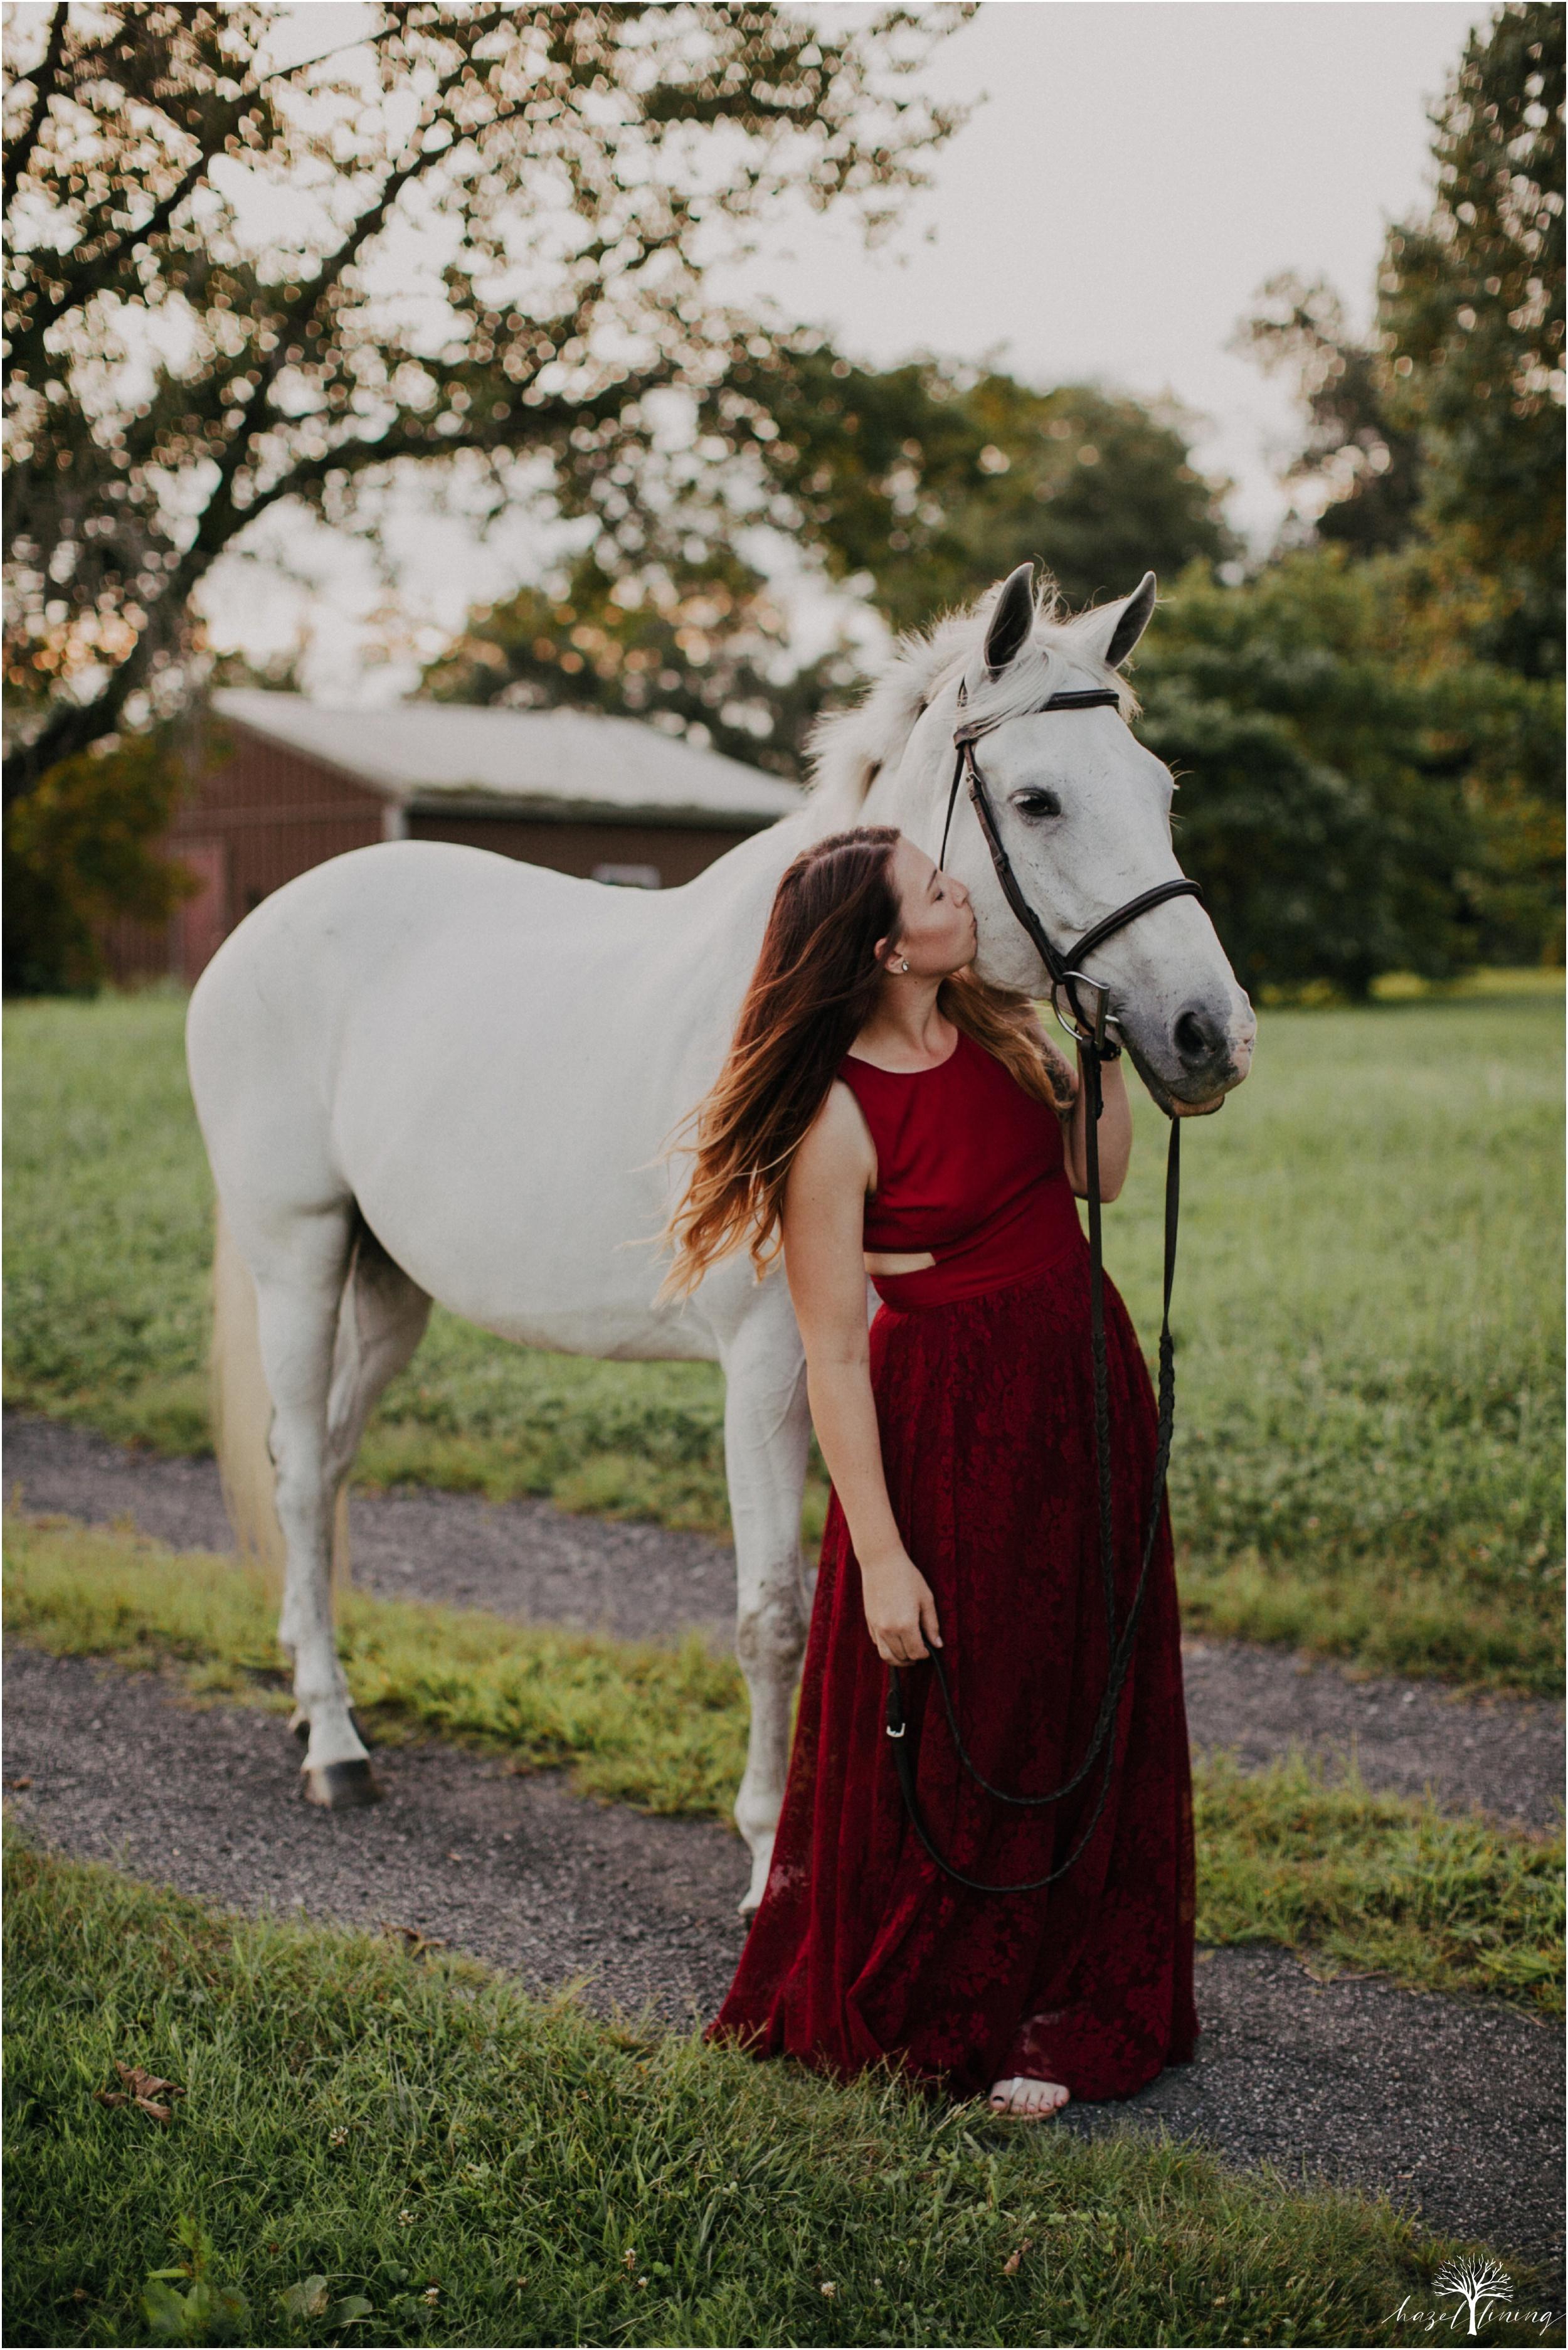 taylor-adams-and-horse-delaware-valley-university-delval-summer-equestrian-portrait-session-hazel-lining-photography-destination-elopement-wedding-engagement-photography_0065.jpg